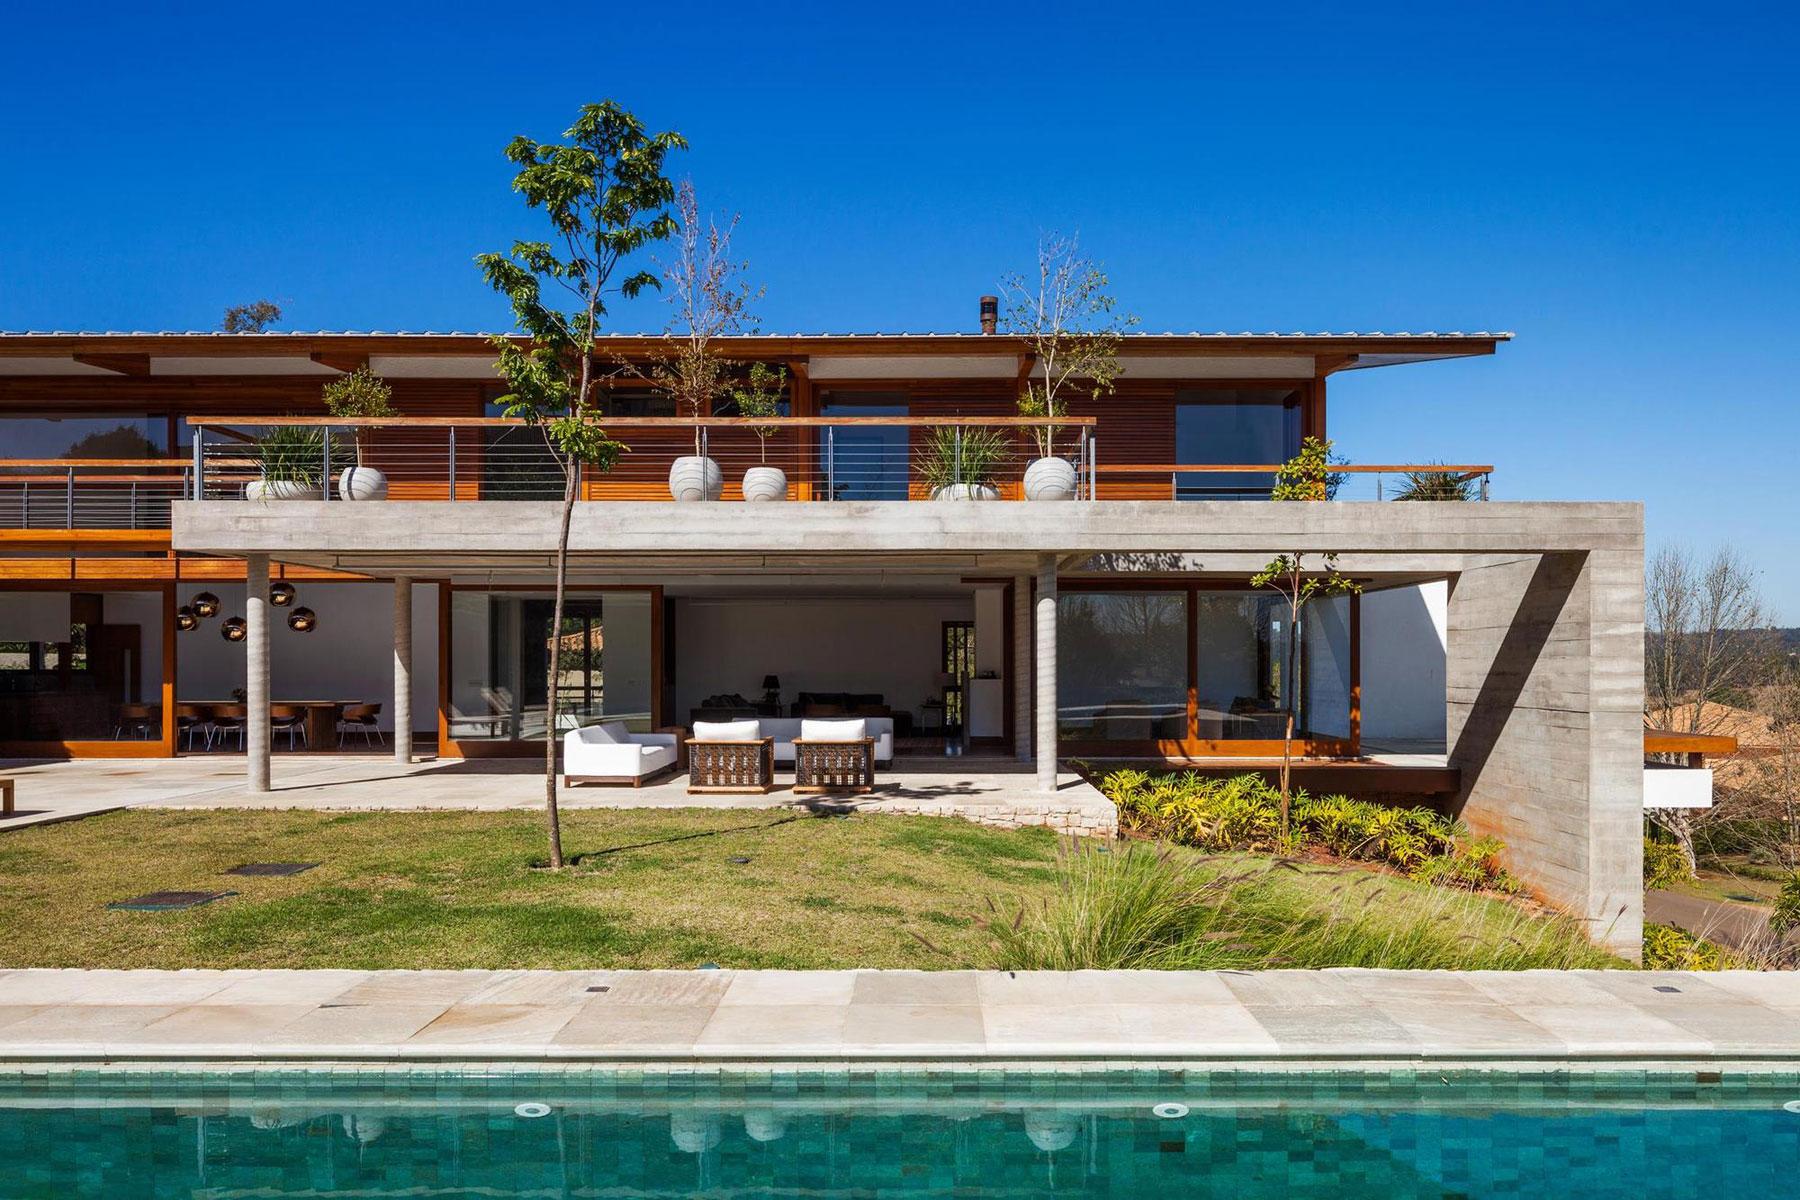 FT Modern Holiday and Weekend House by Reinach Mendonça Arquitetos Associados-02